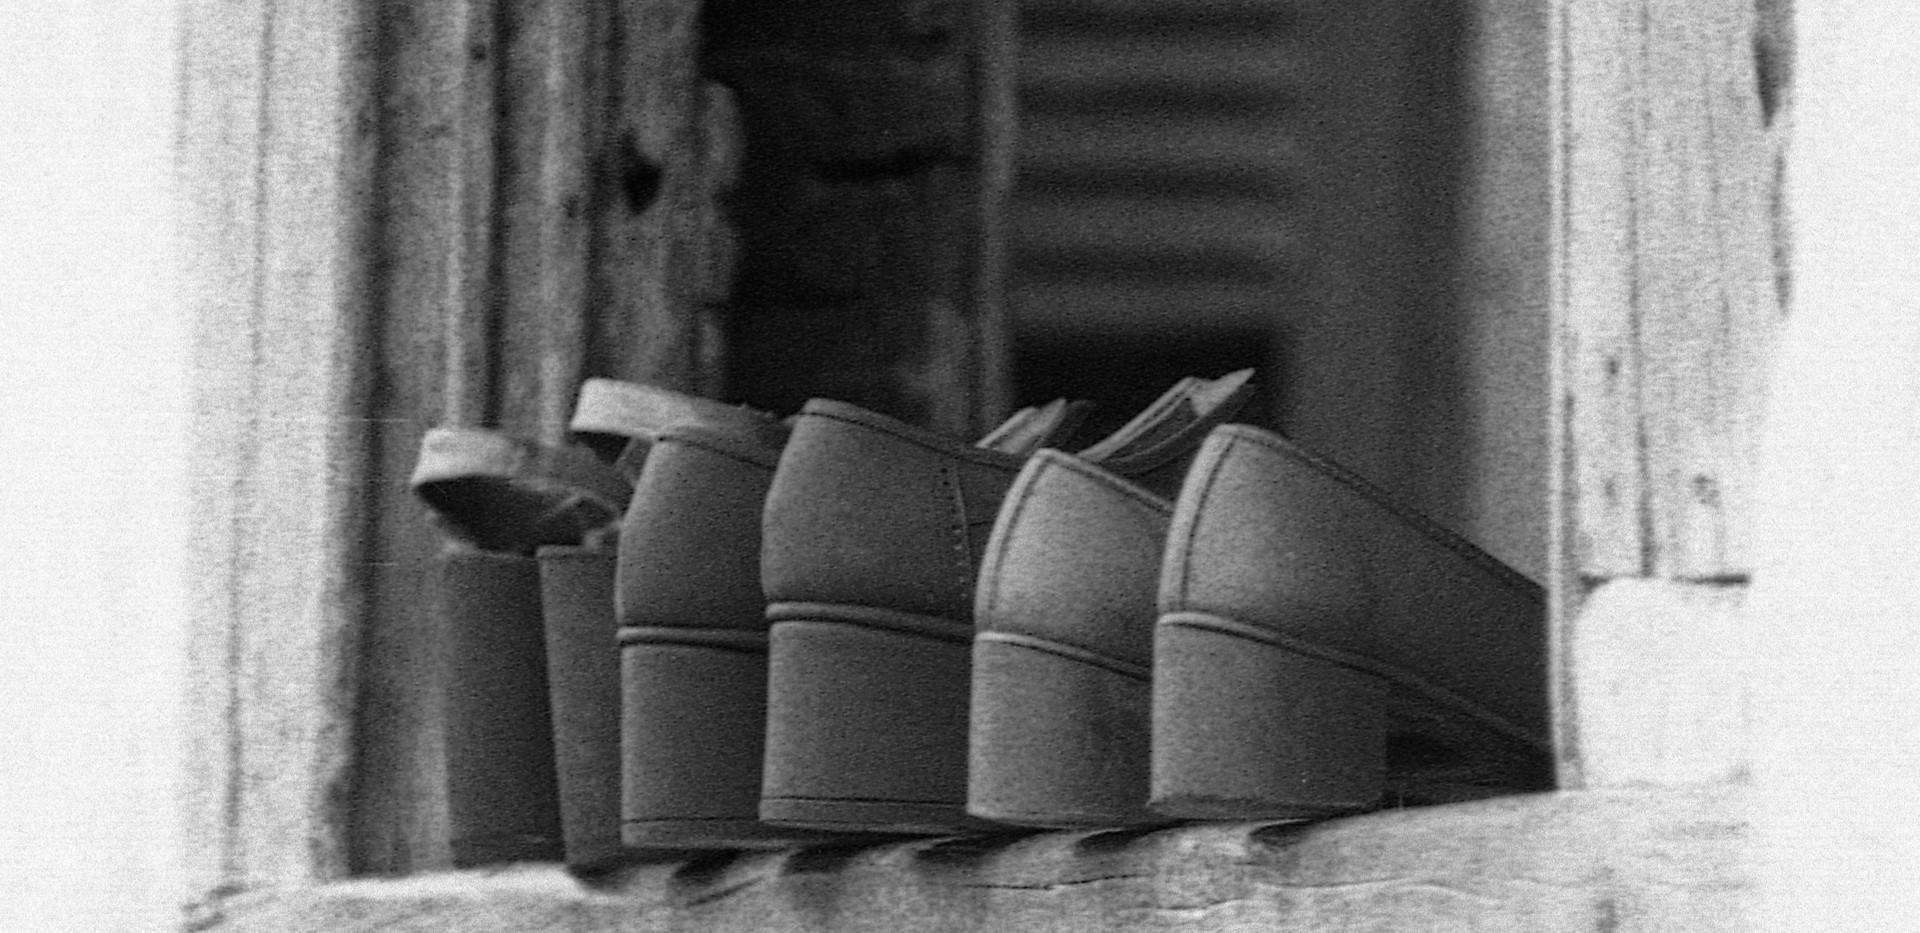 Oro Preto Shoes on window sill.jpg